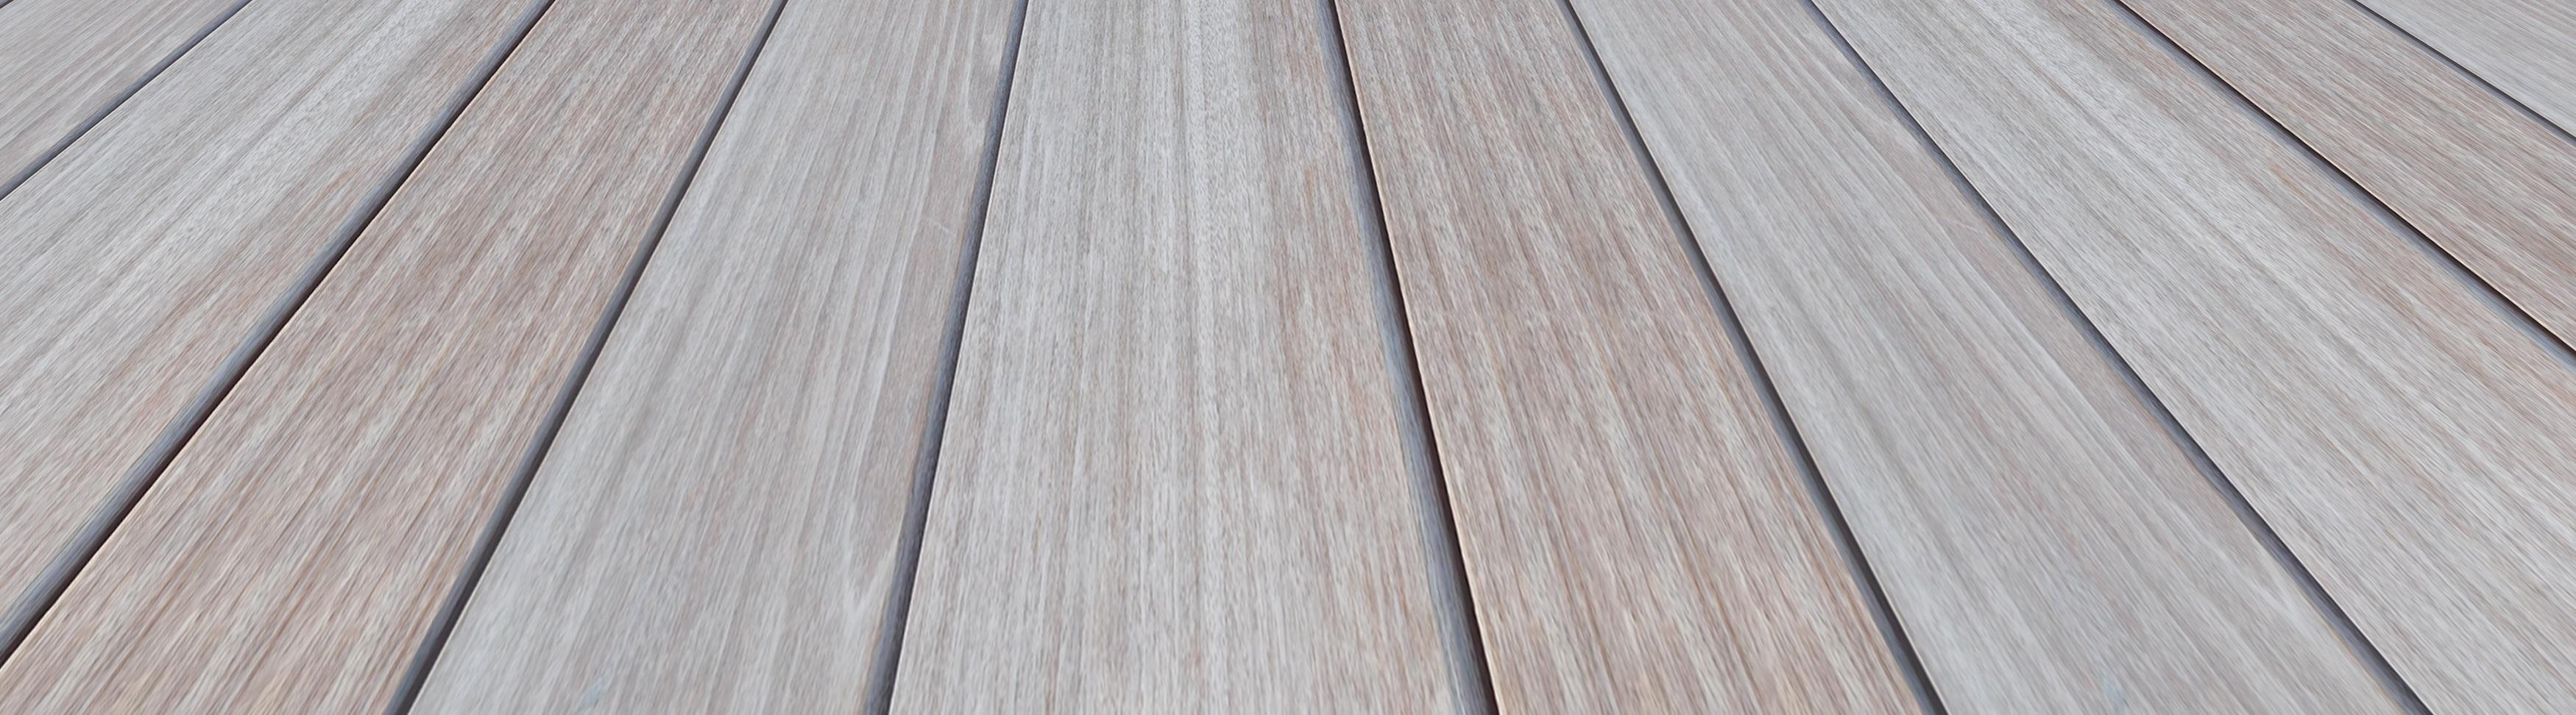 Fotos gratis cubierta piso madera dura madera - Suelo de madera ...